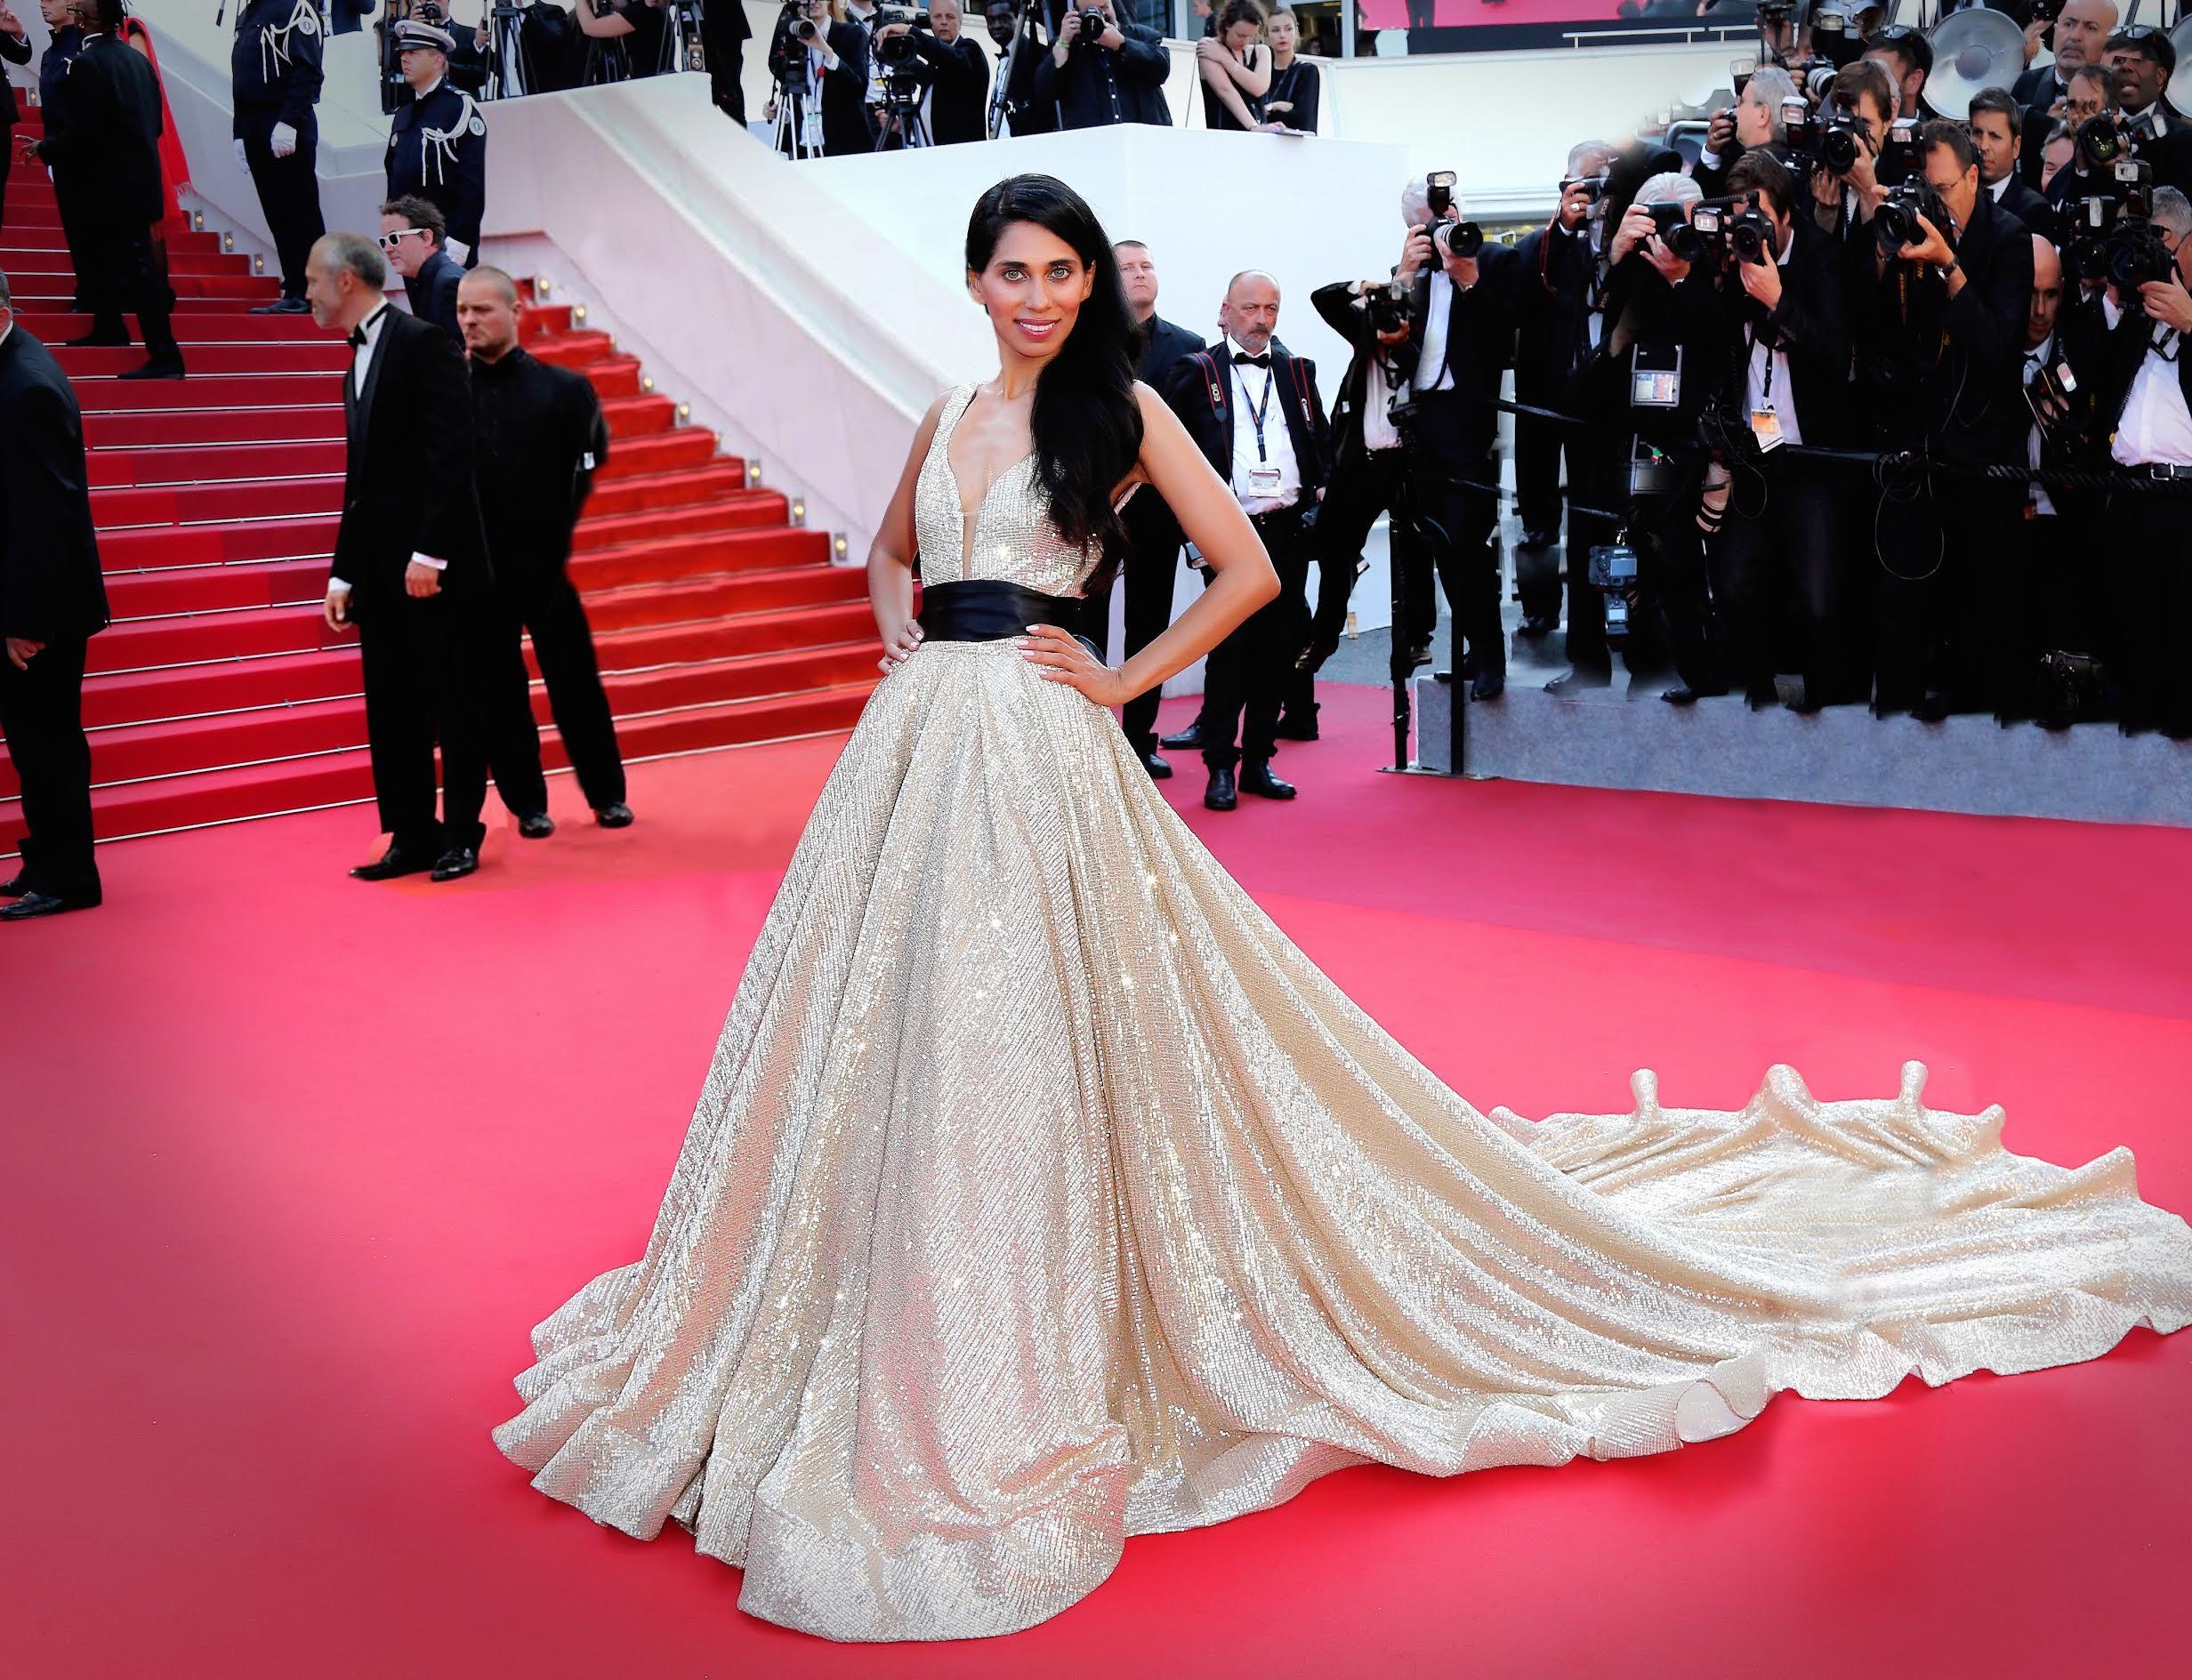 Fagun Thakrar arrives at the closing night gala at the 70th Cannes Film Festival